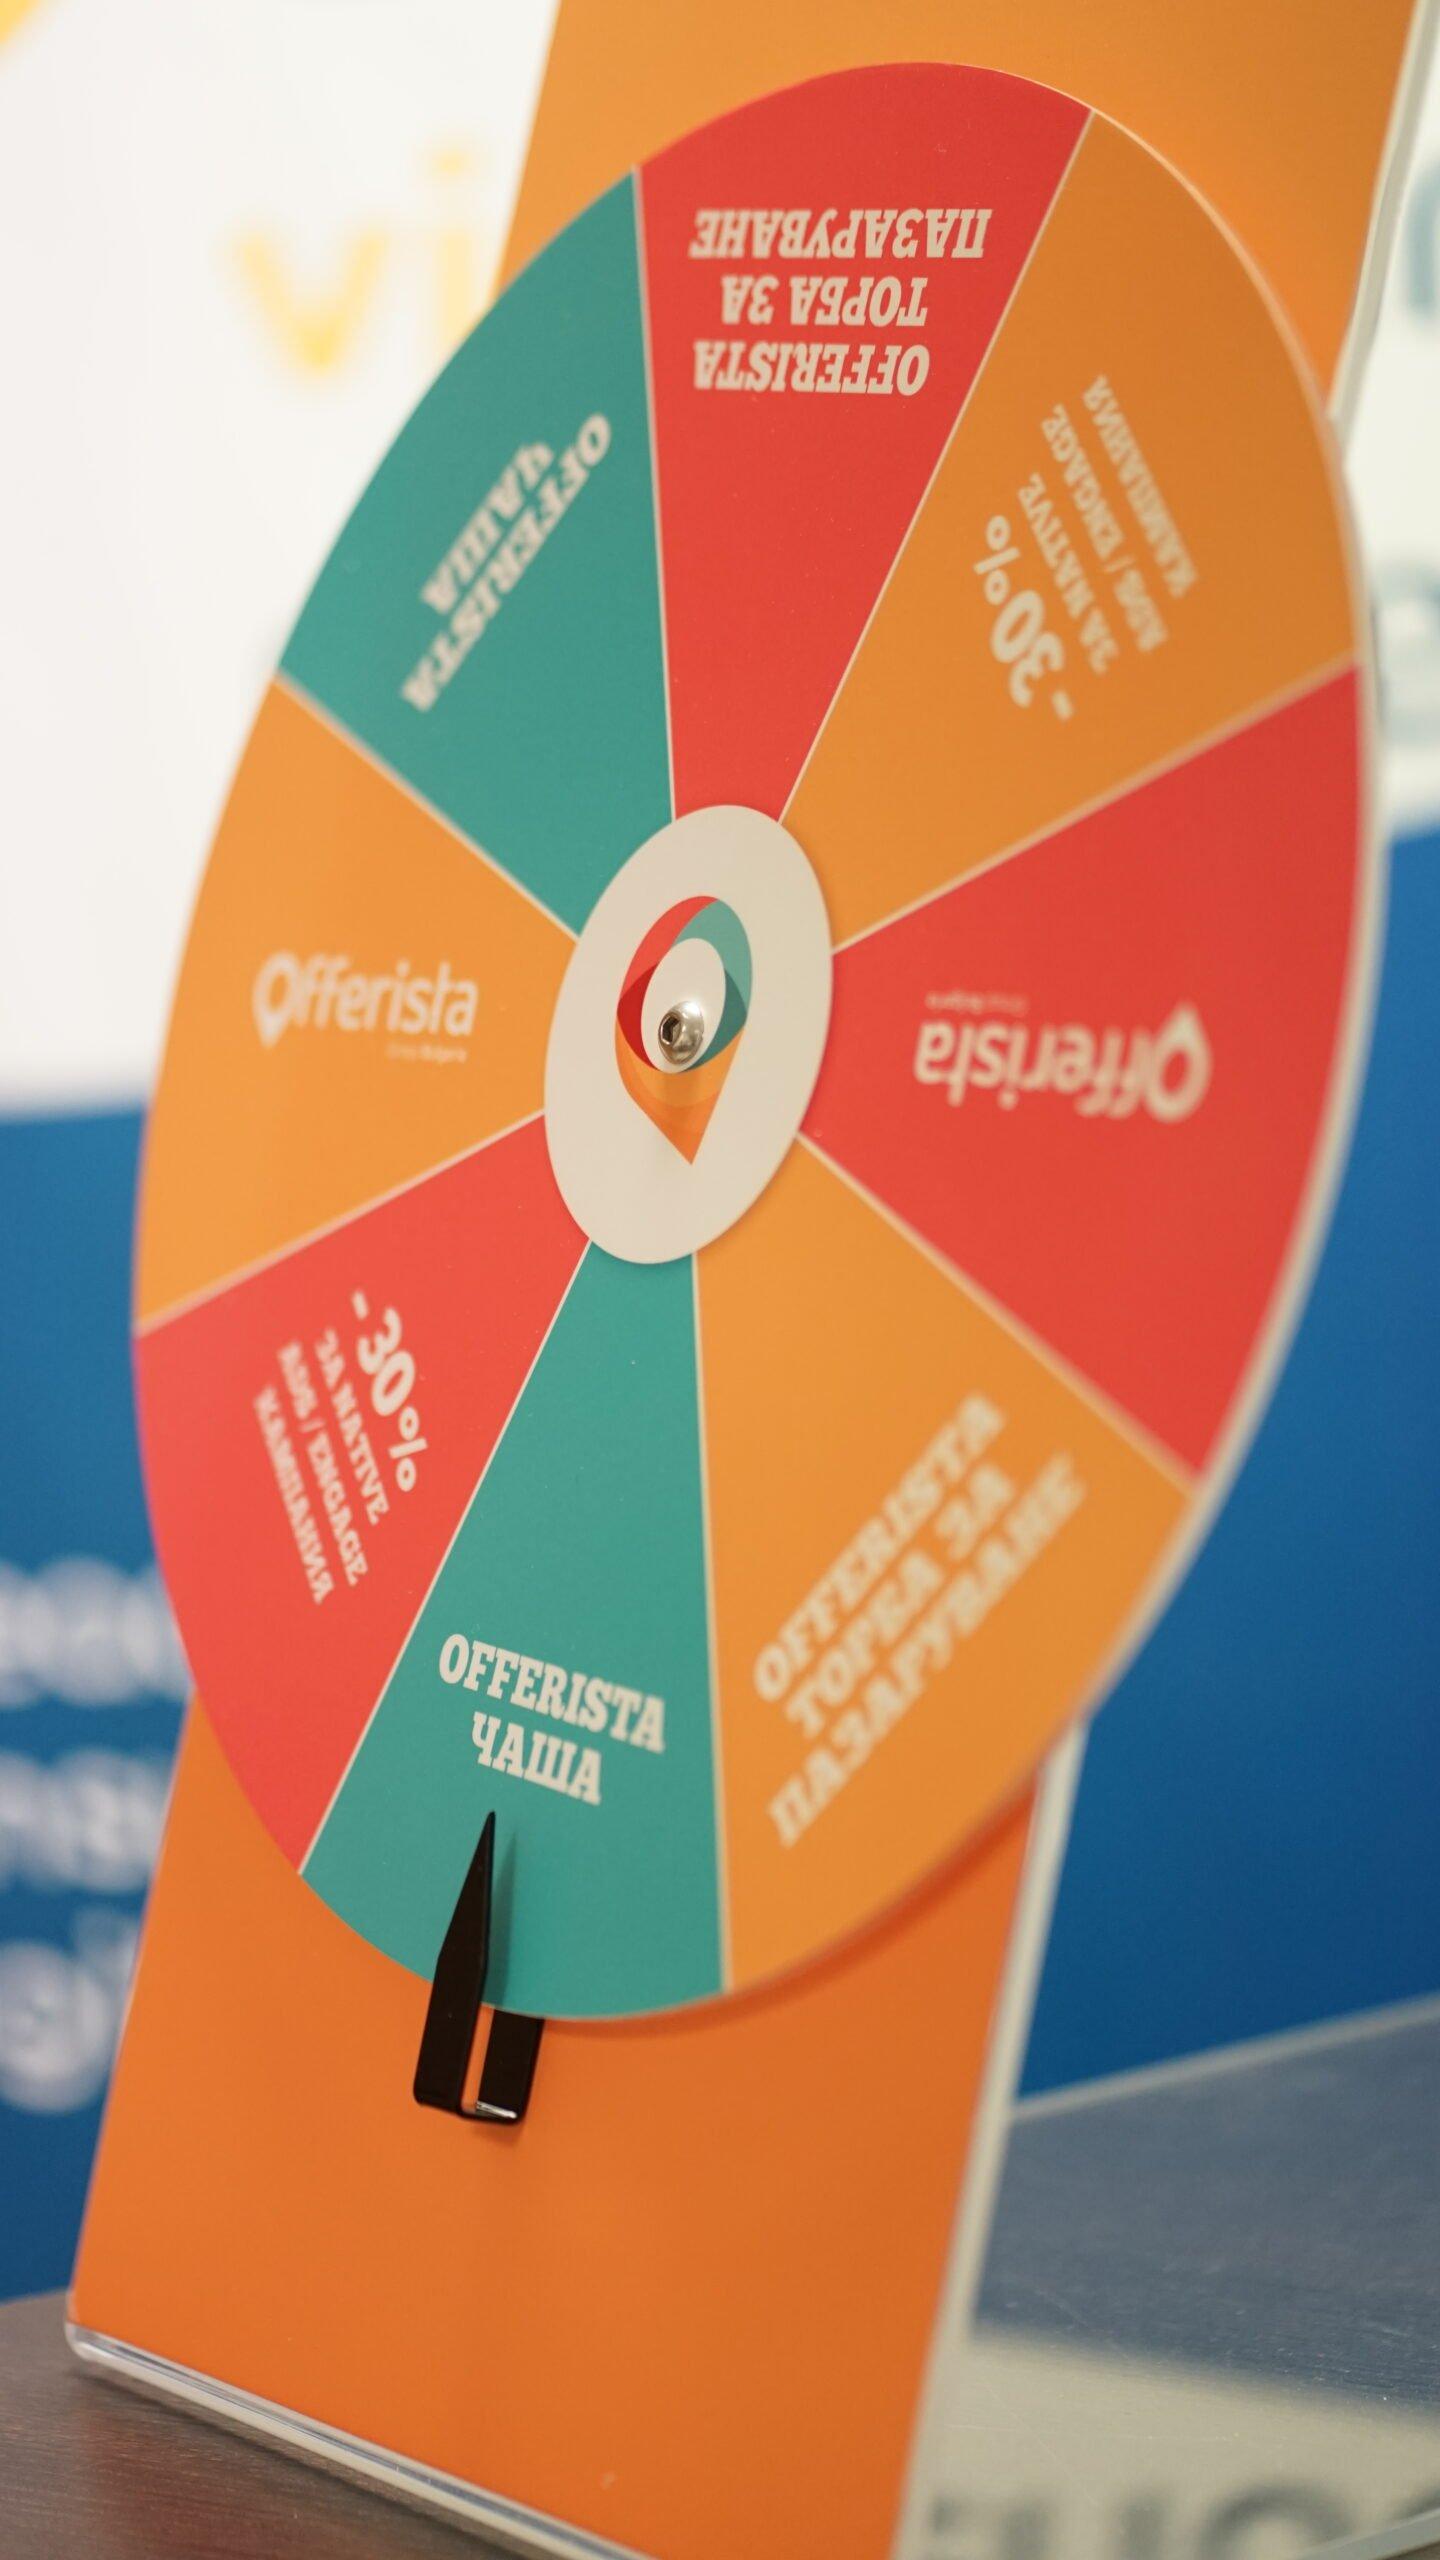 Offerista prize wheel